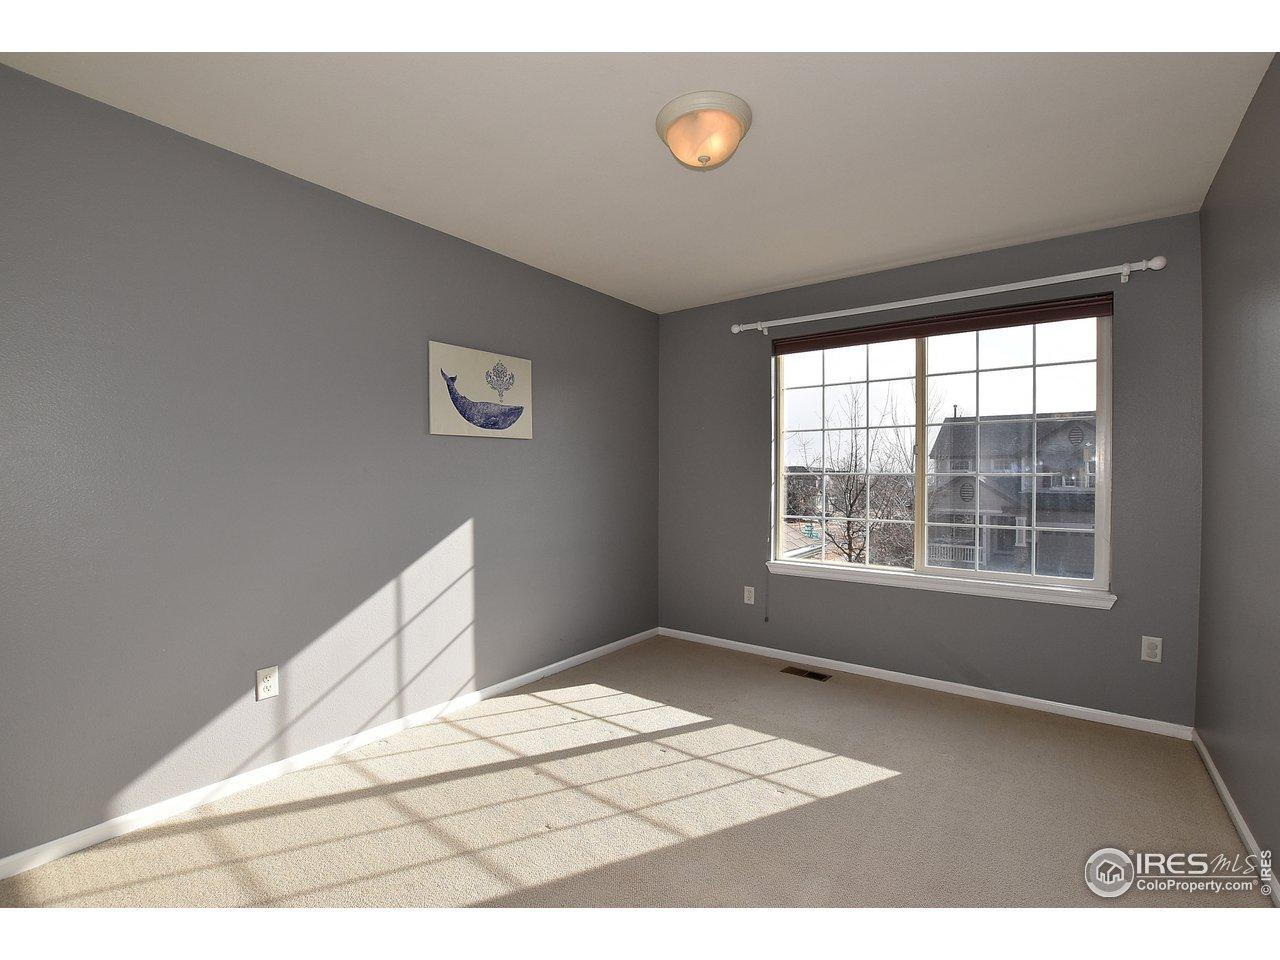 Bedroom 2 W/ Decorator Paint